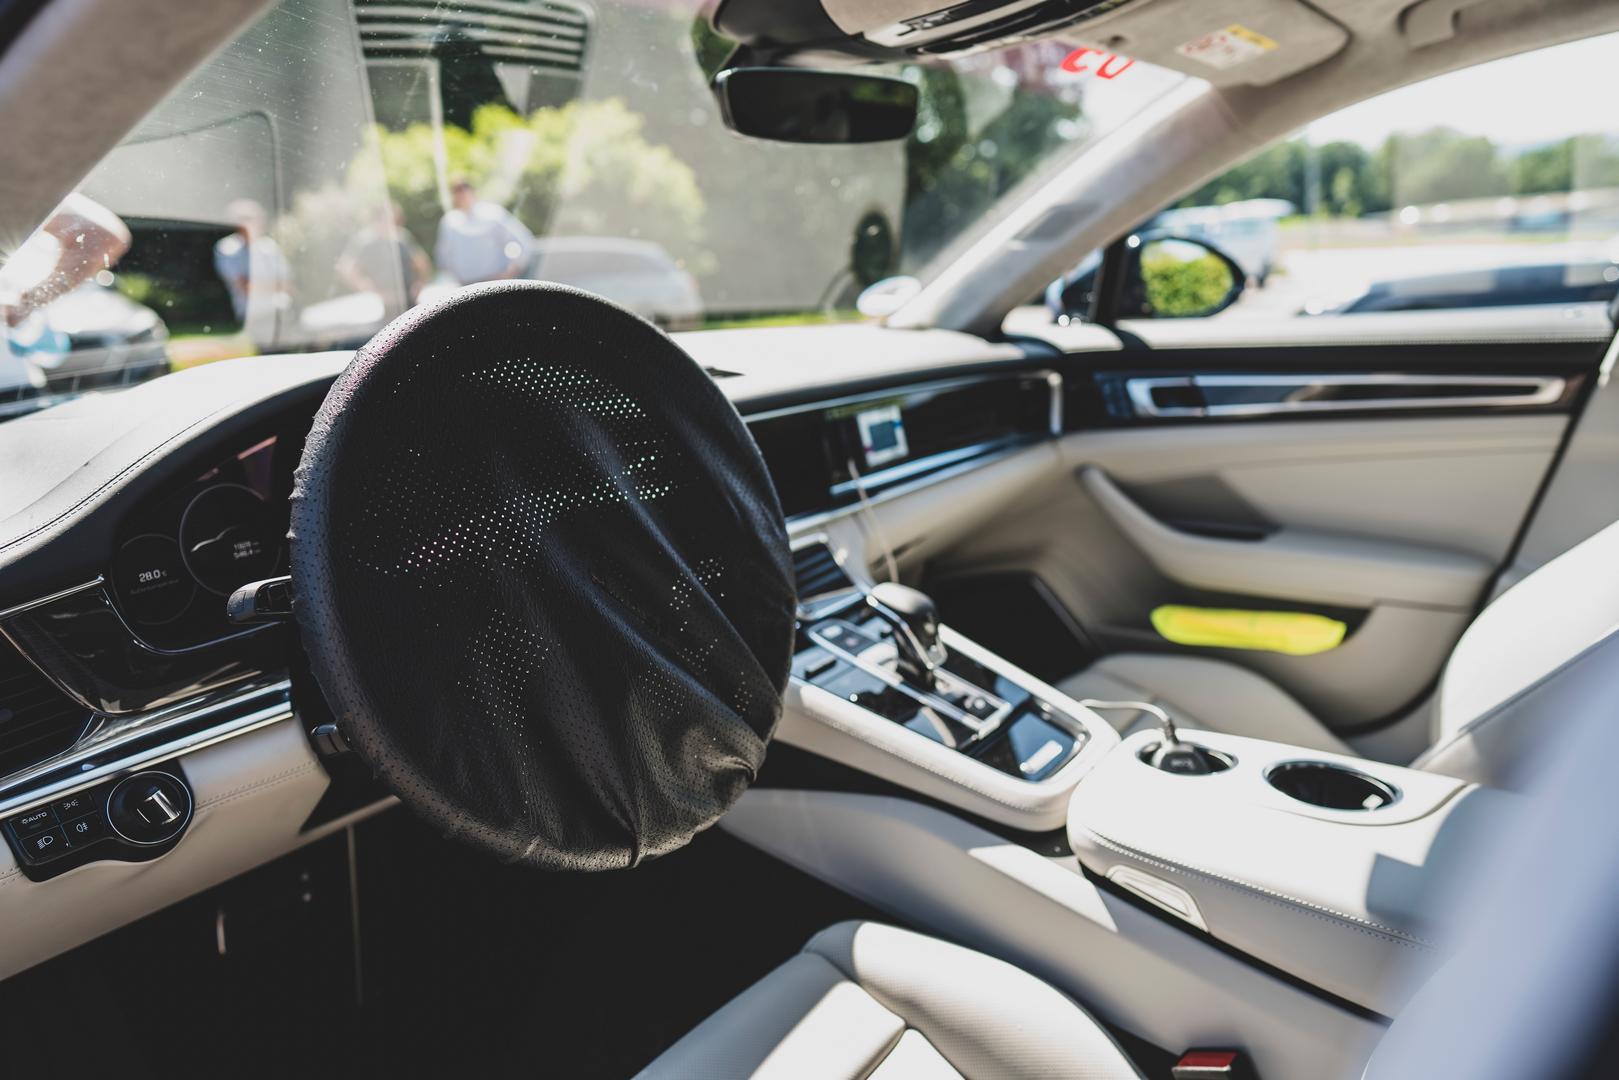 prototype drive 2021 porsche panamera facelift gtspirit 2021 porsche panamera facelift